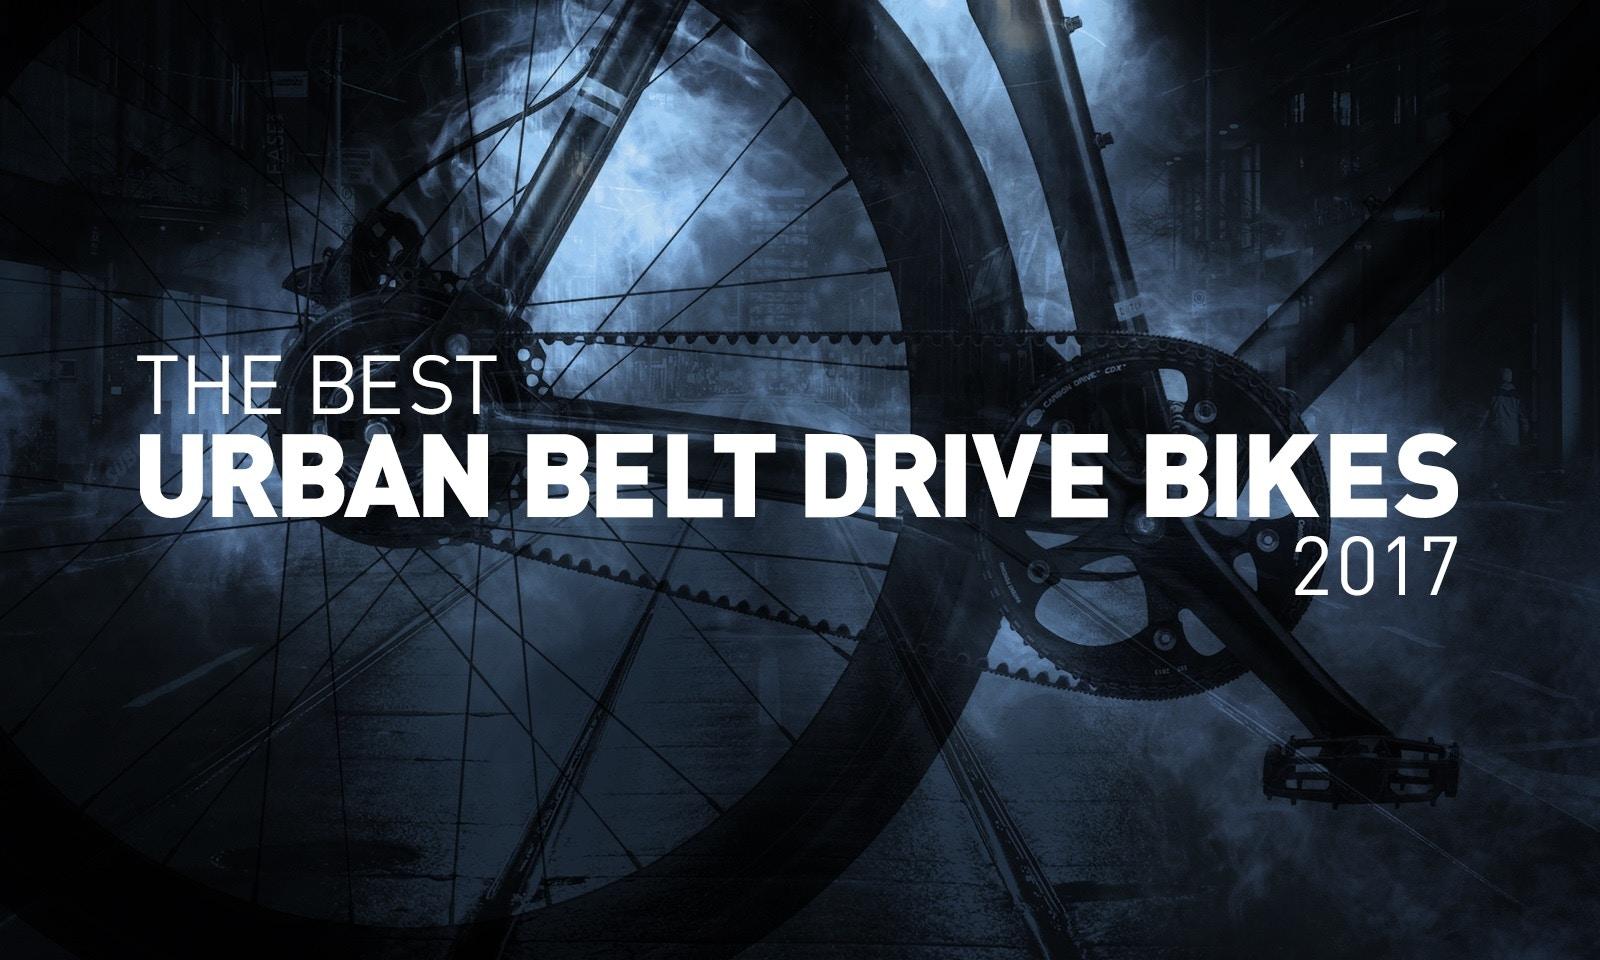 Best Urban Belt Drive Bikes 2017